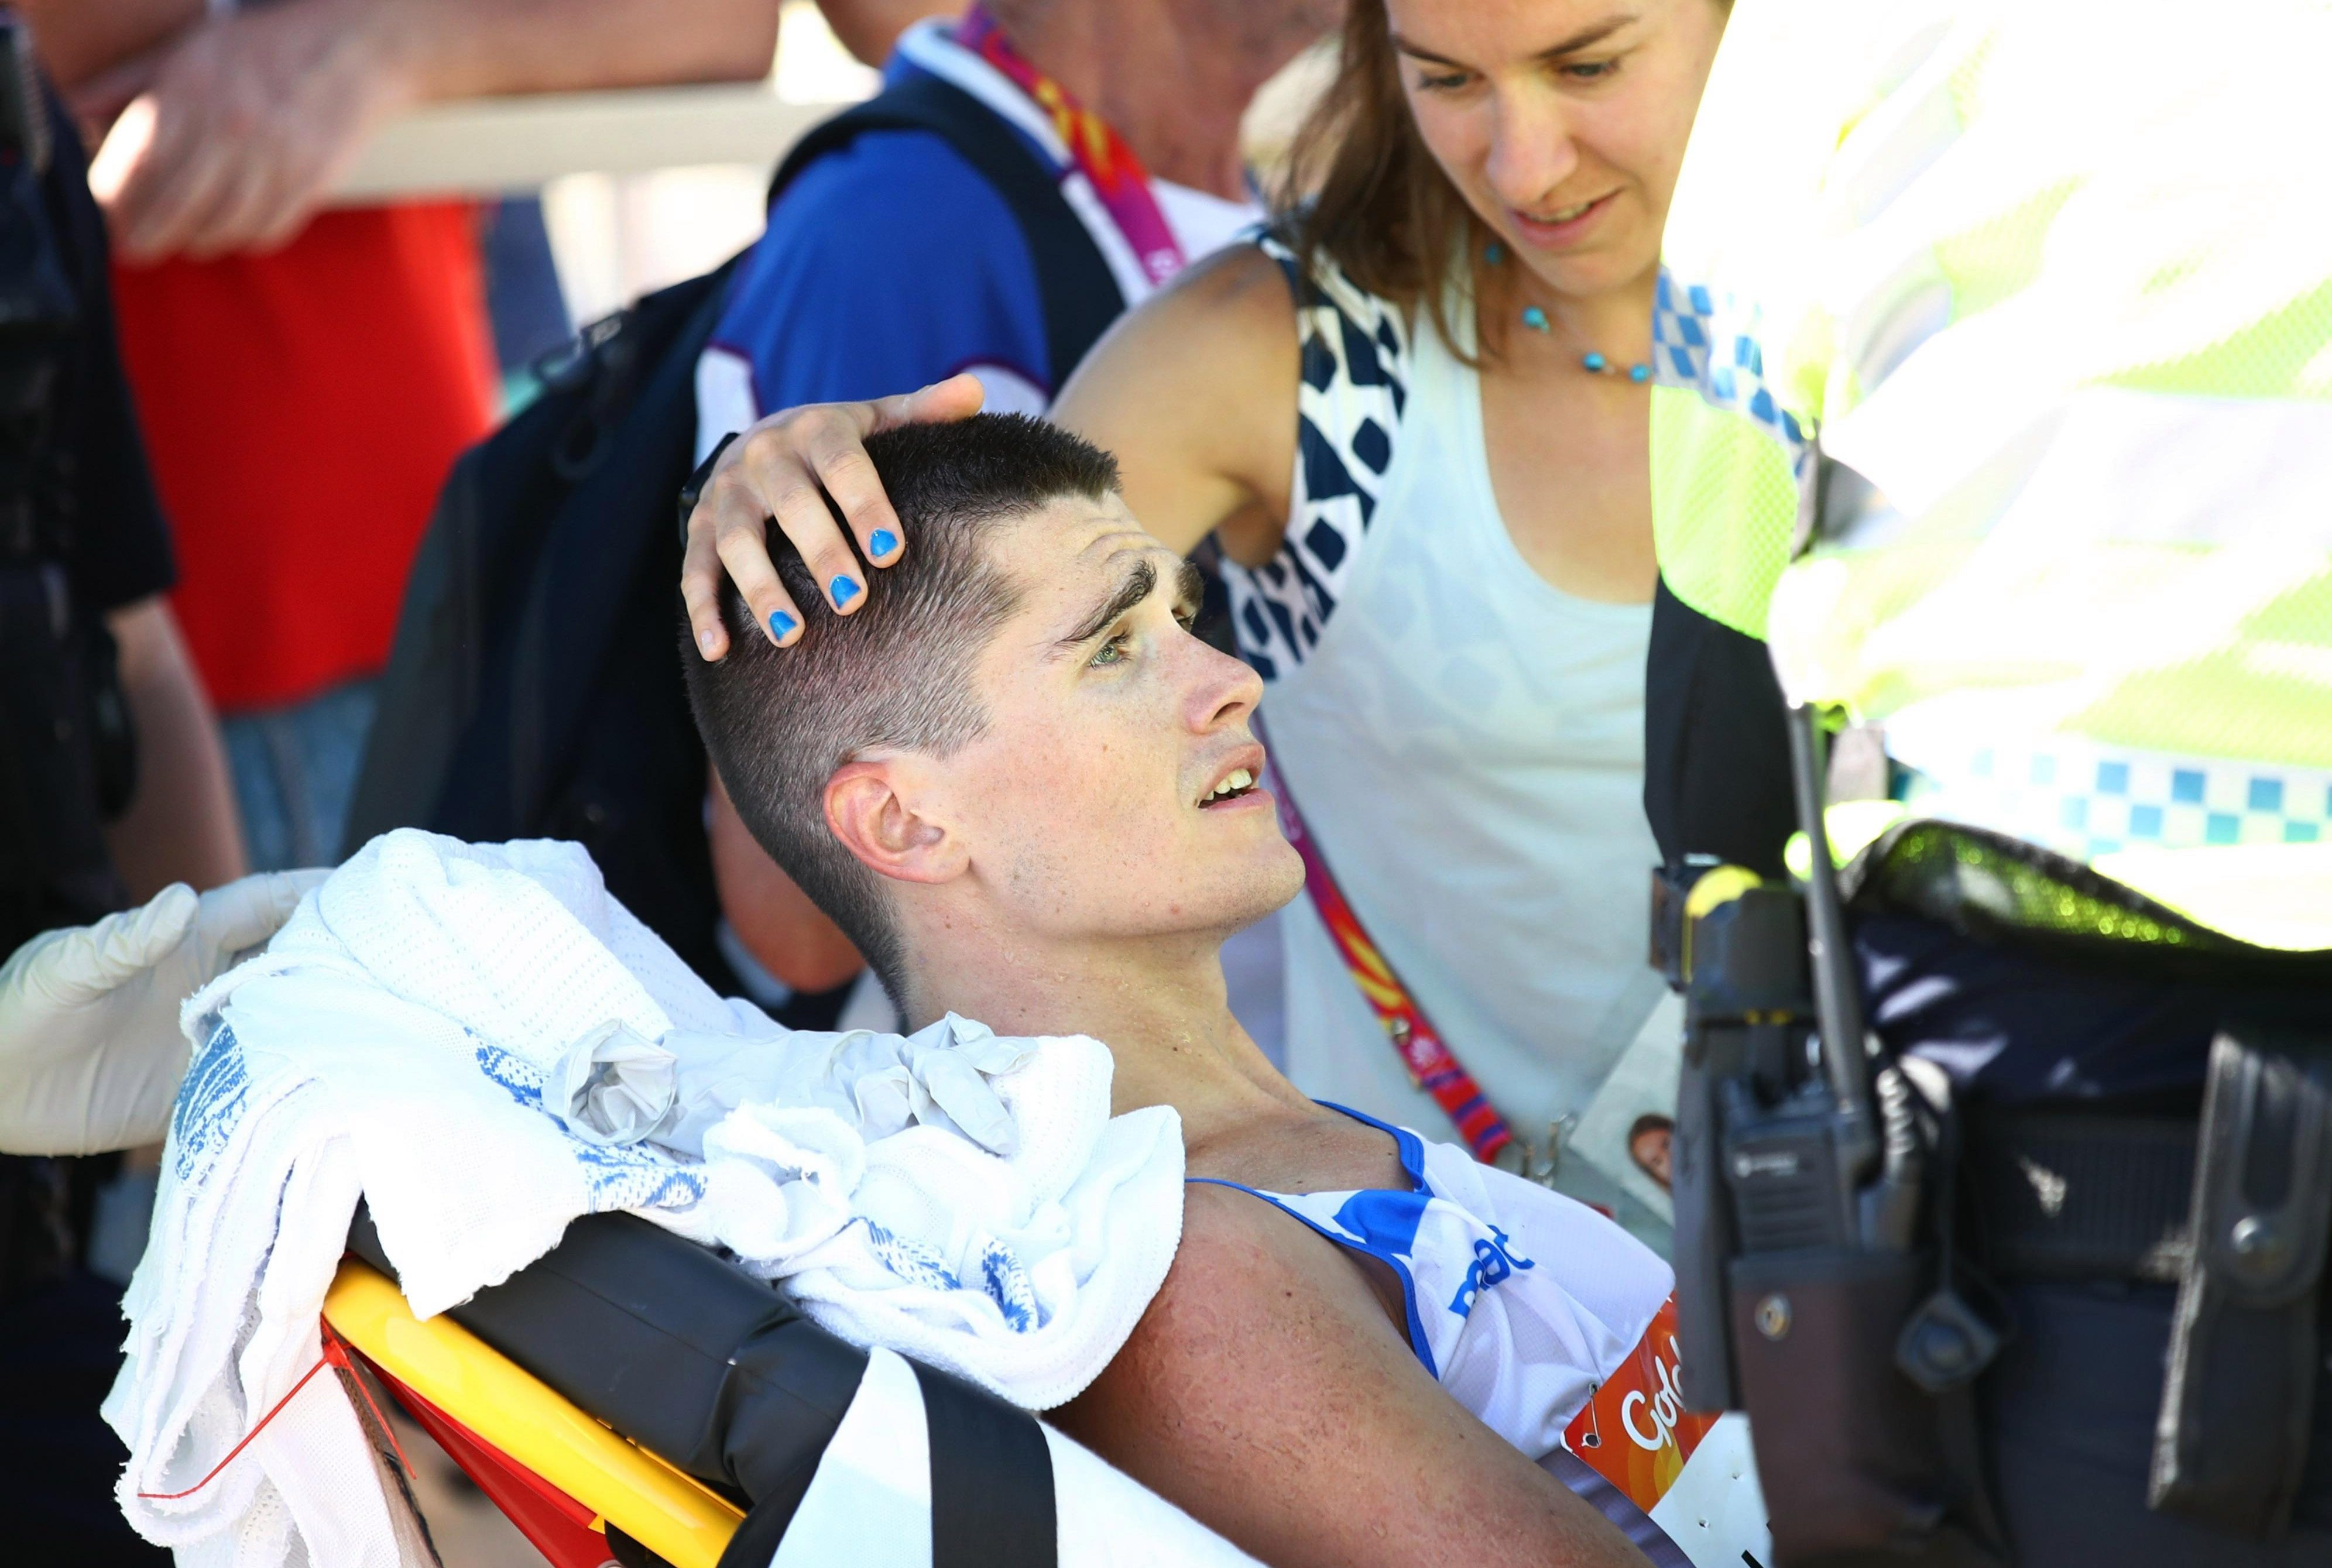 Medics were slated for leaving for runner unattended for several minutes